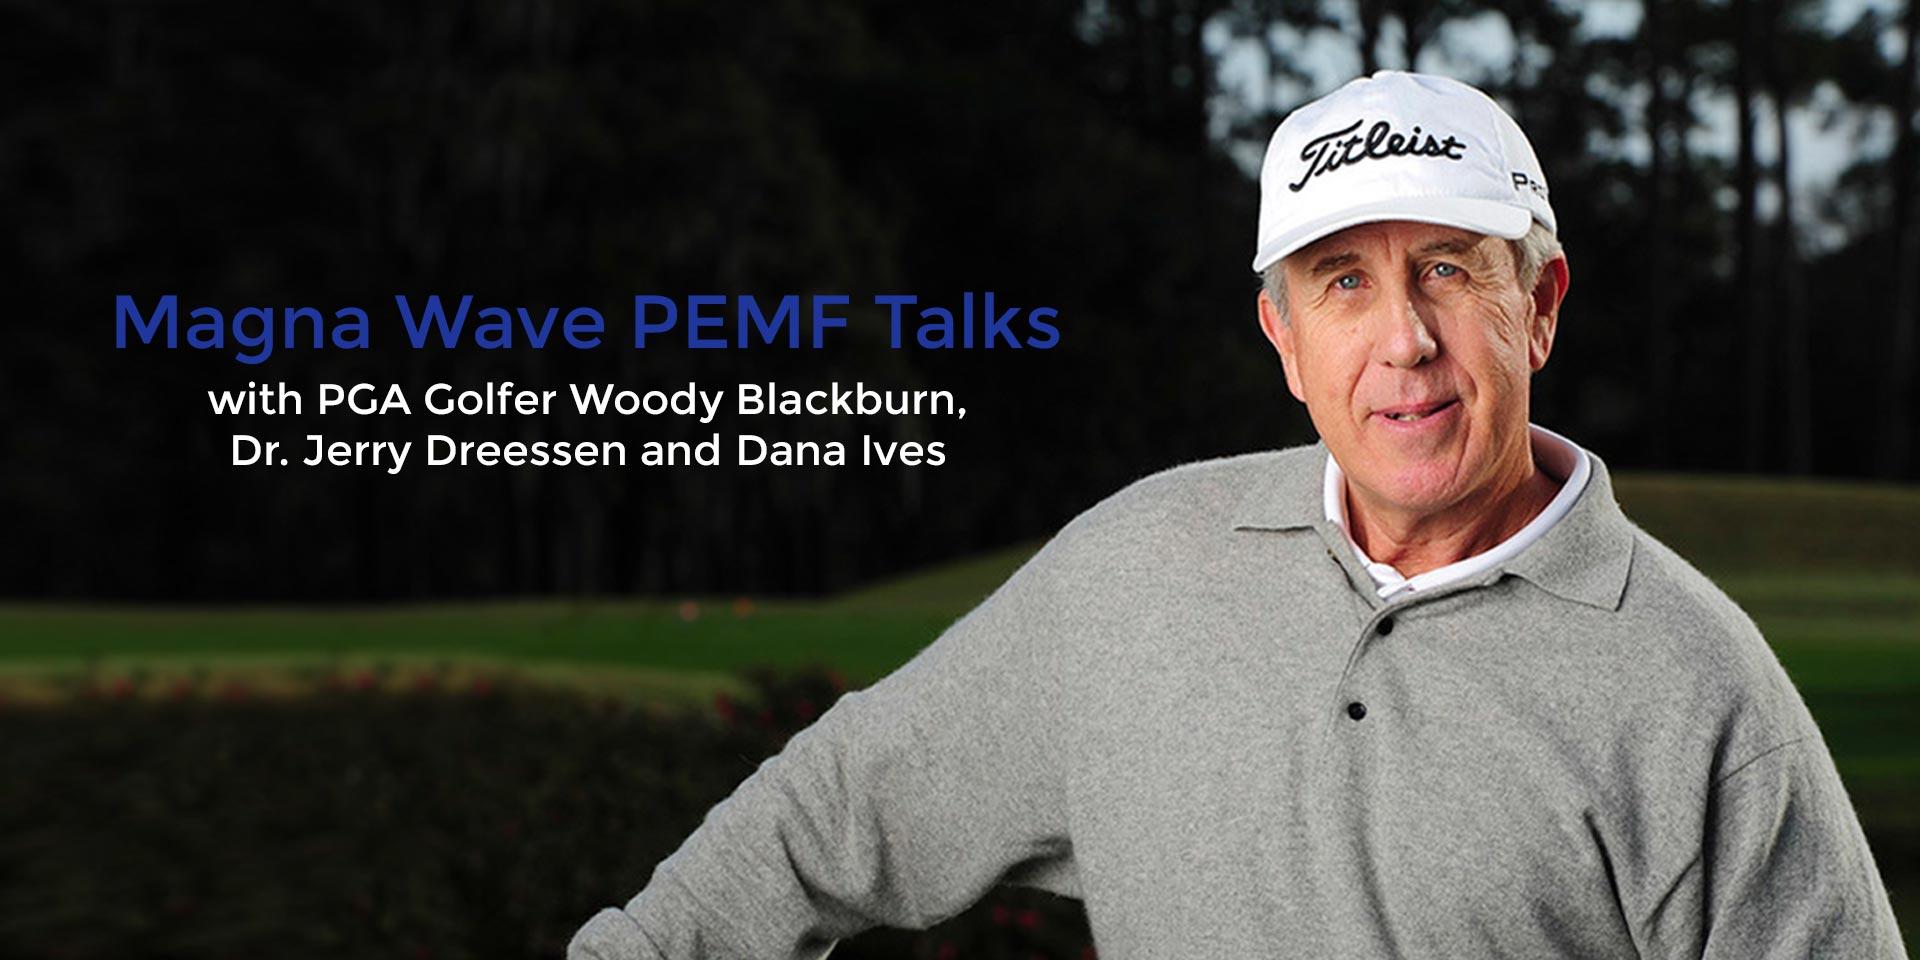 Magna Wave PEMF Talks with PGA Golfer Woody Blackburn, Dr. Jerry Dreessen and Dana Ives